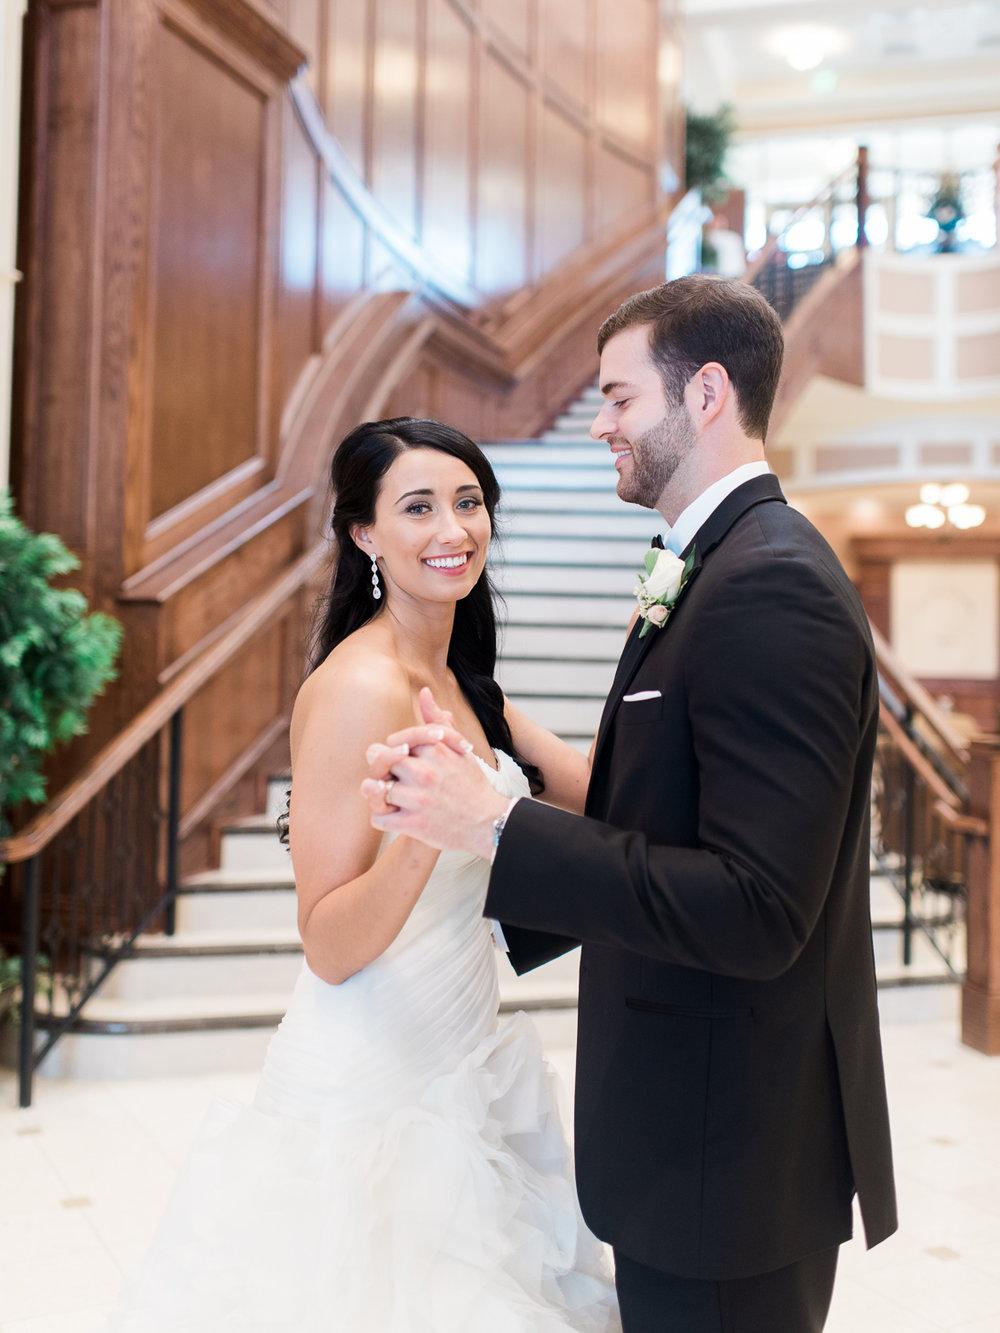 alexgreg-wedding-bridegroomdancing-christinadavisphoto05.jpg